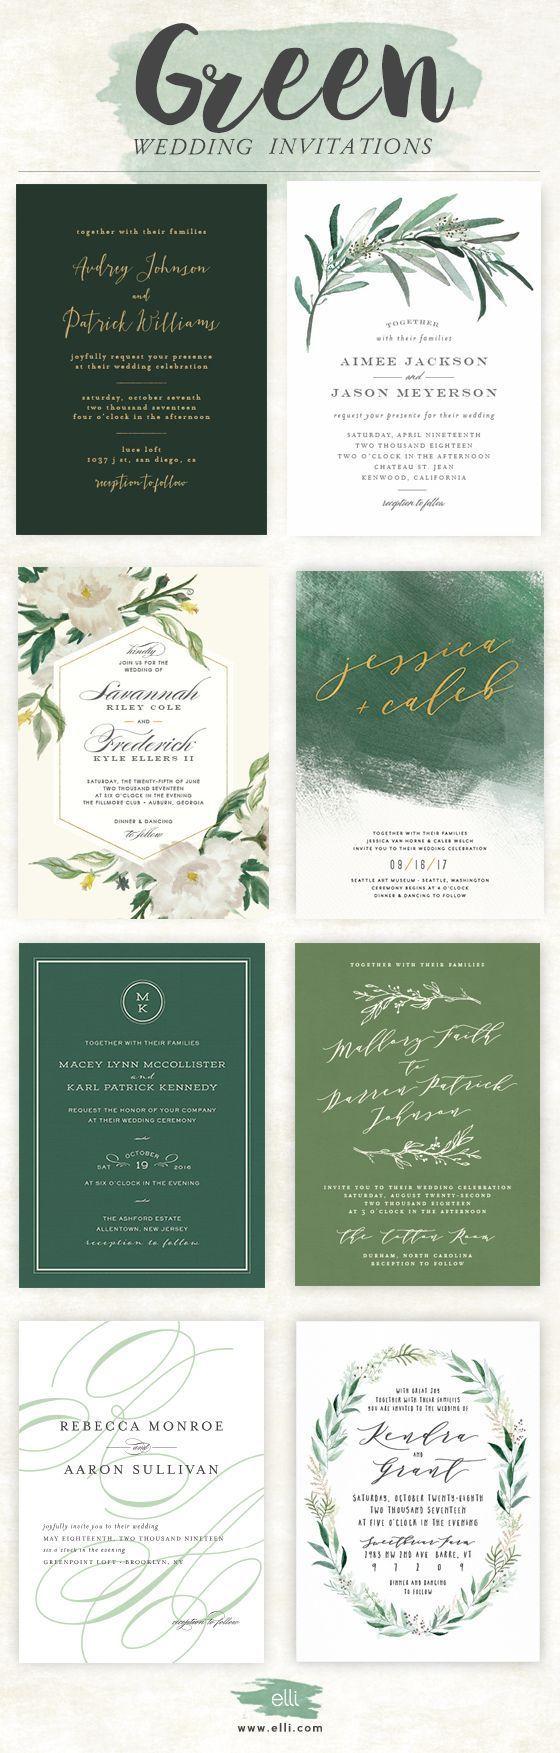 information on wedding invitation examples%0A Gorgeous selection of green wedding invitations from Elli com